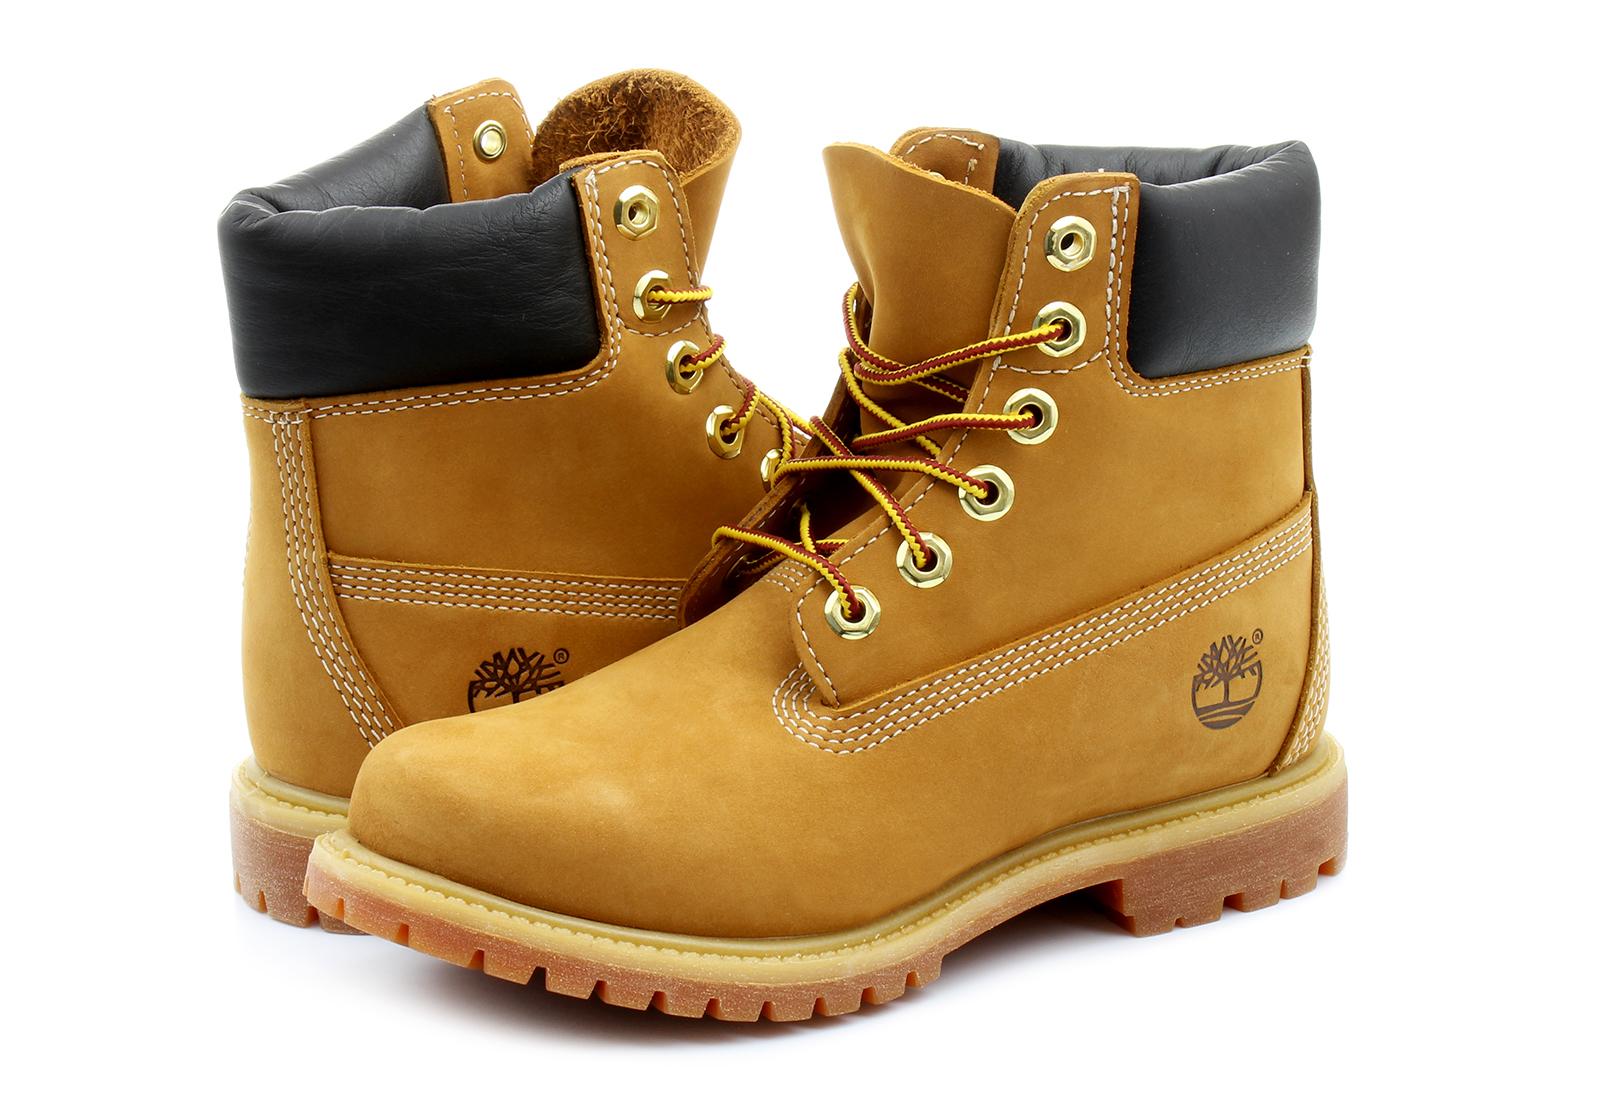 7bd601fb898 Timberland Boty Farmářky - 6in Prem Boot - 10361-wheTenisky